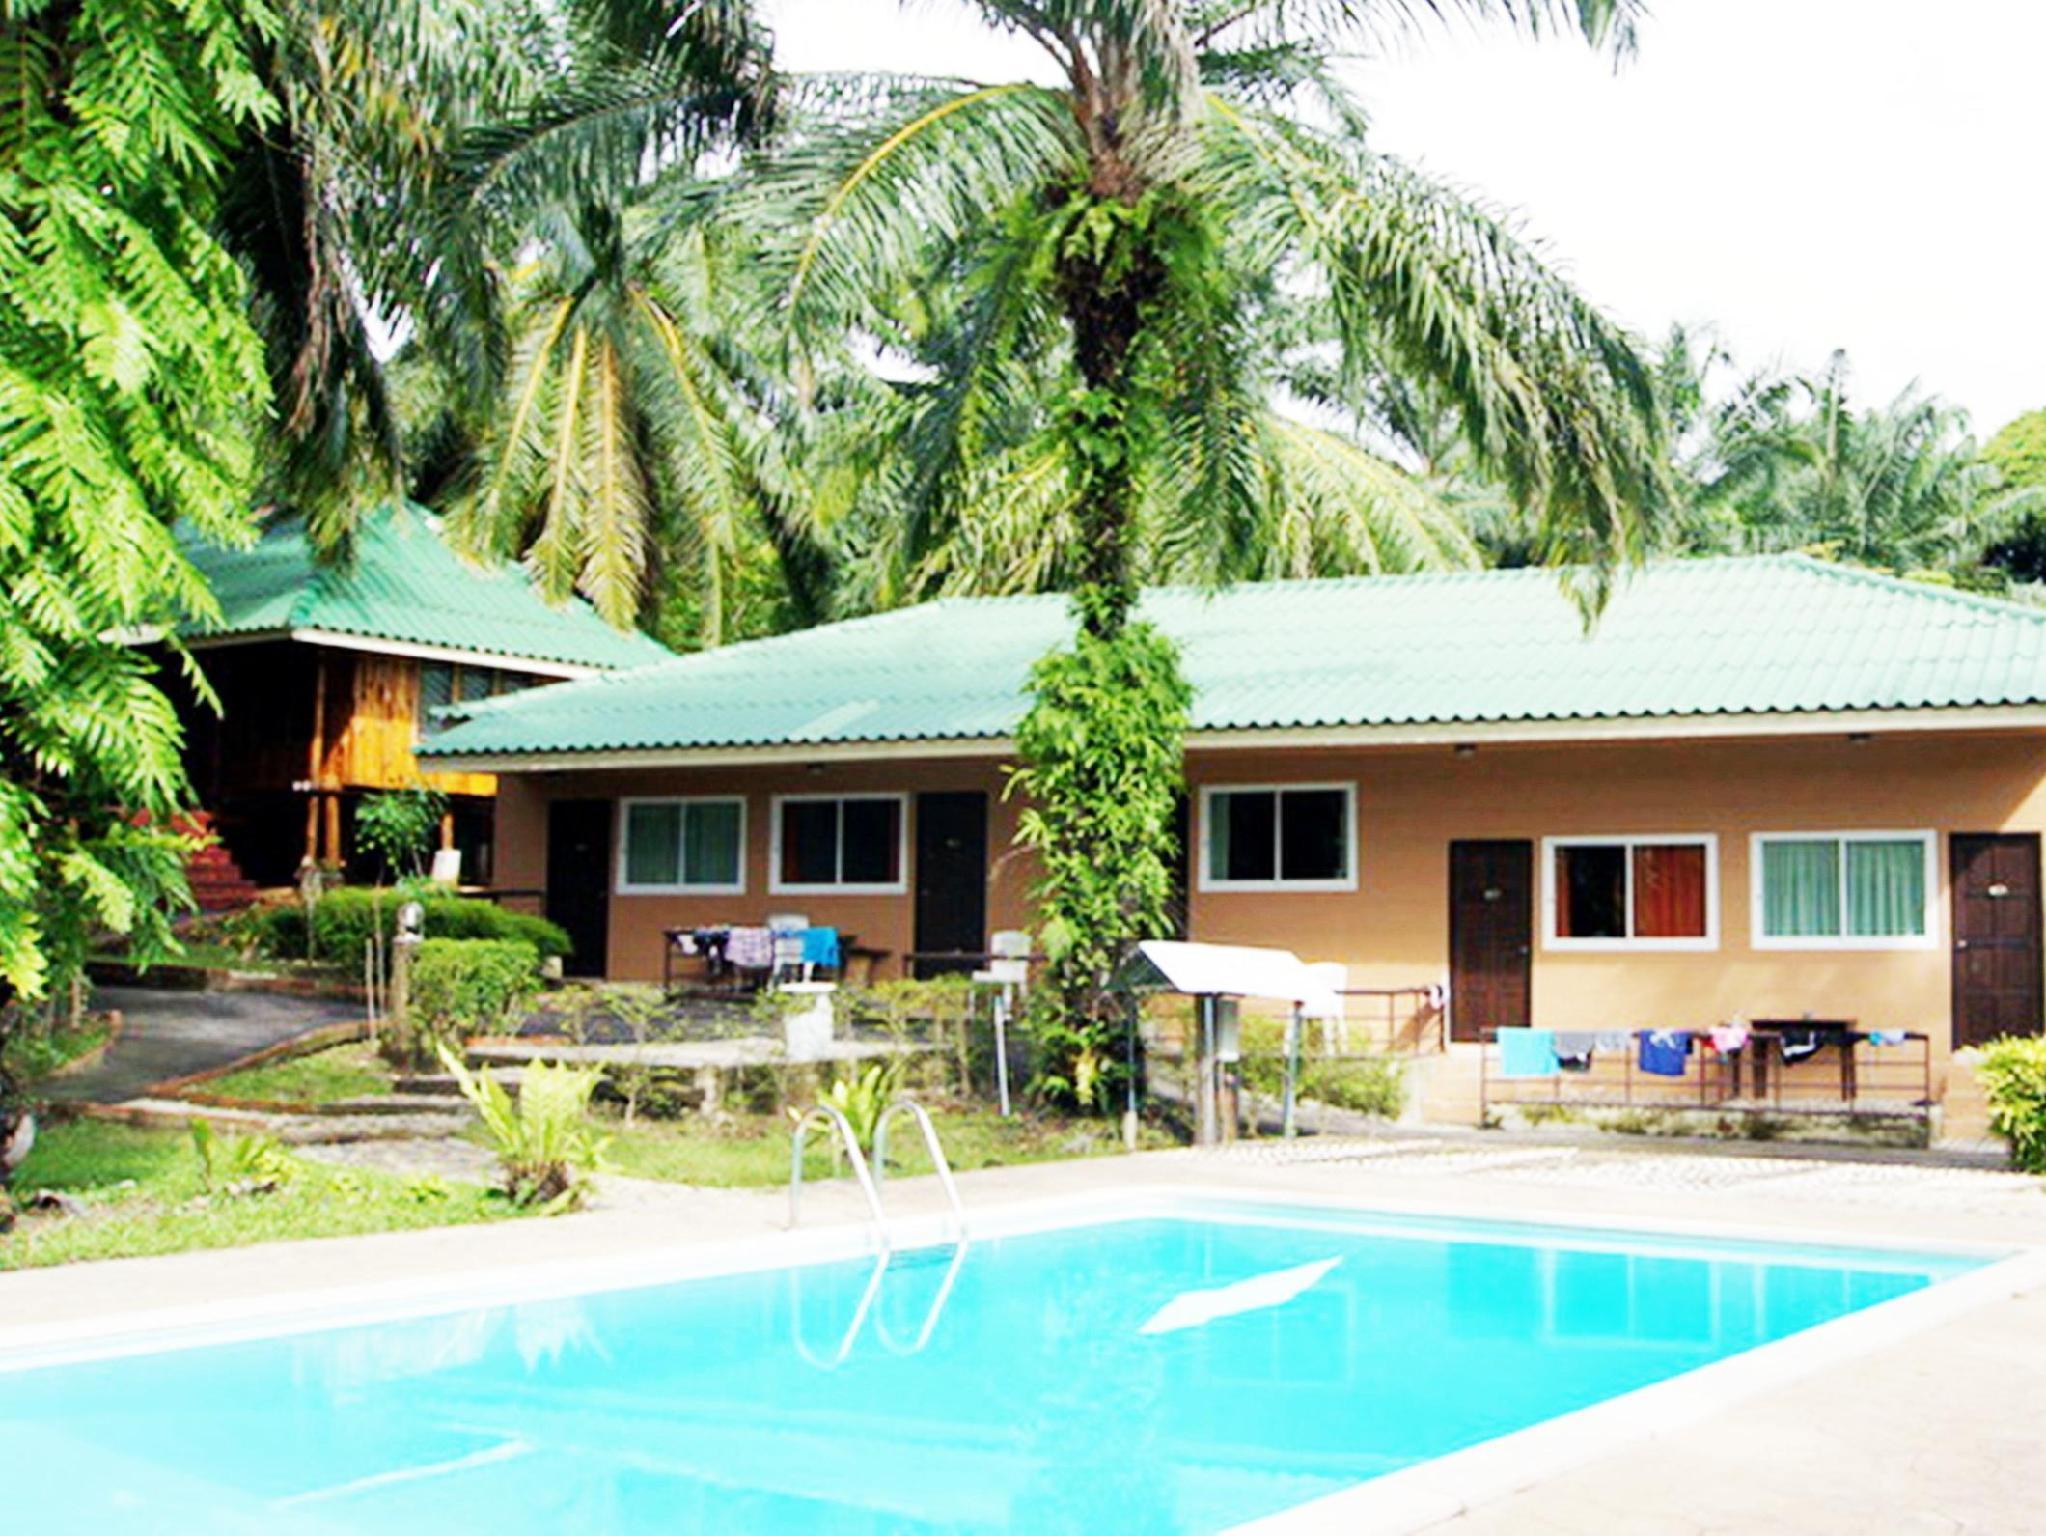 Blue Village Resort by Chanintra